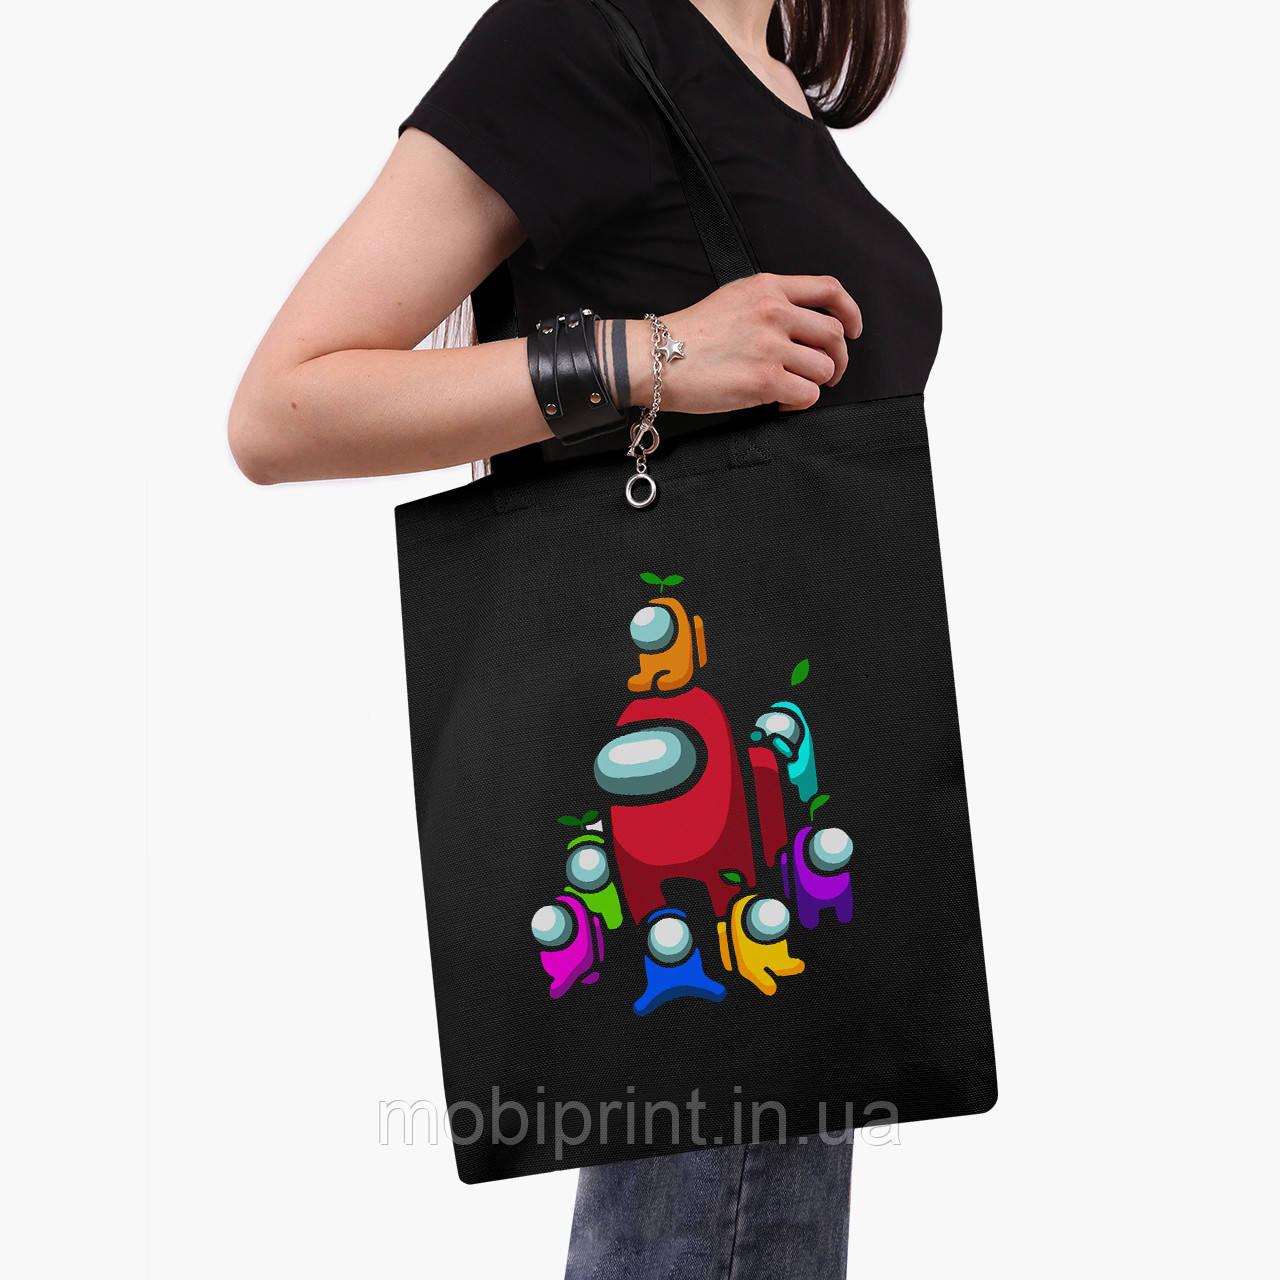 Эко сумка шоппер черная Амонг Ас (Among Us) (9227-2596-2)  41*35 см